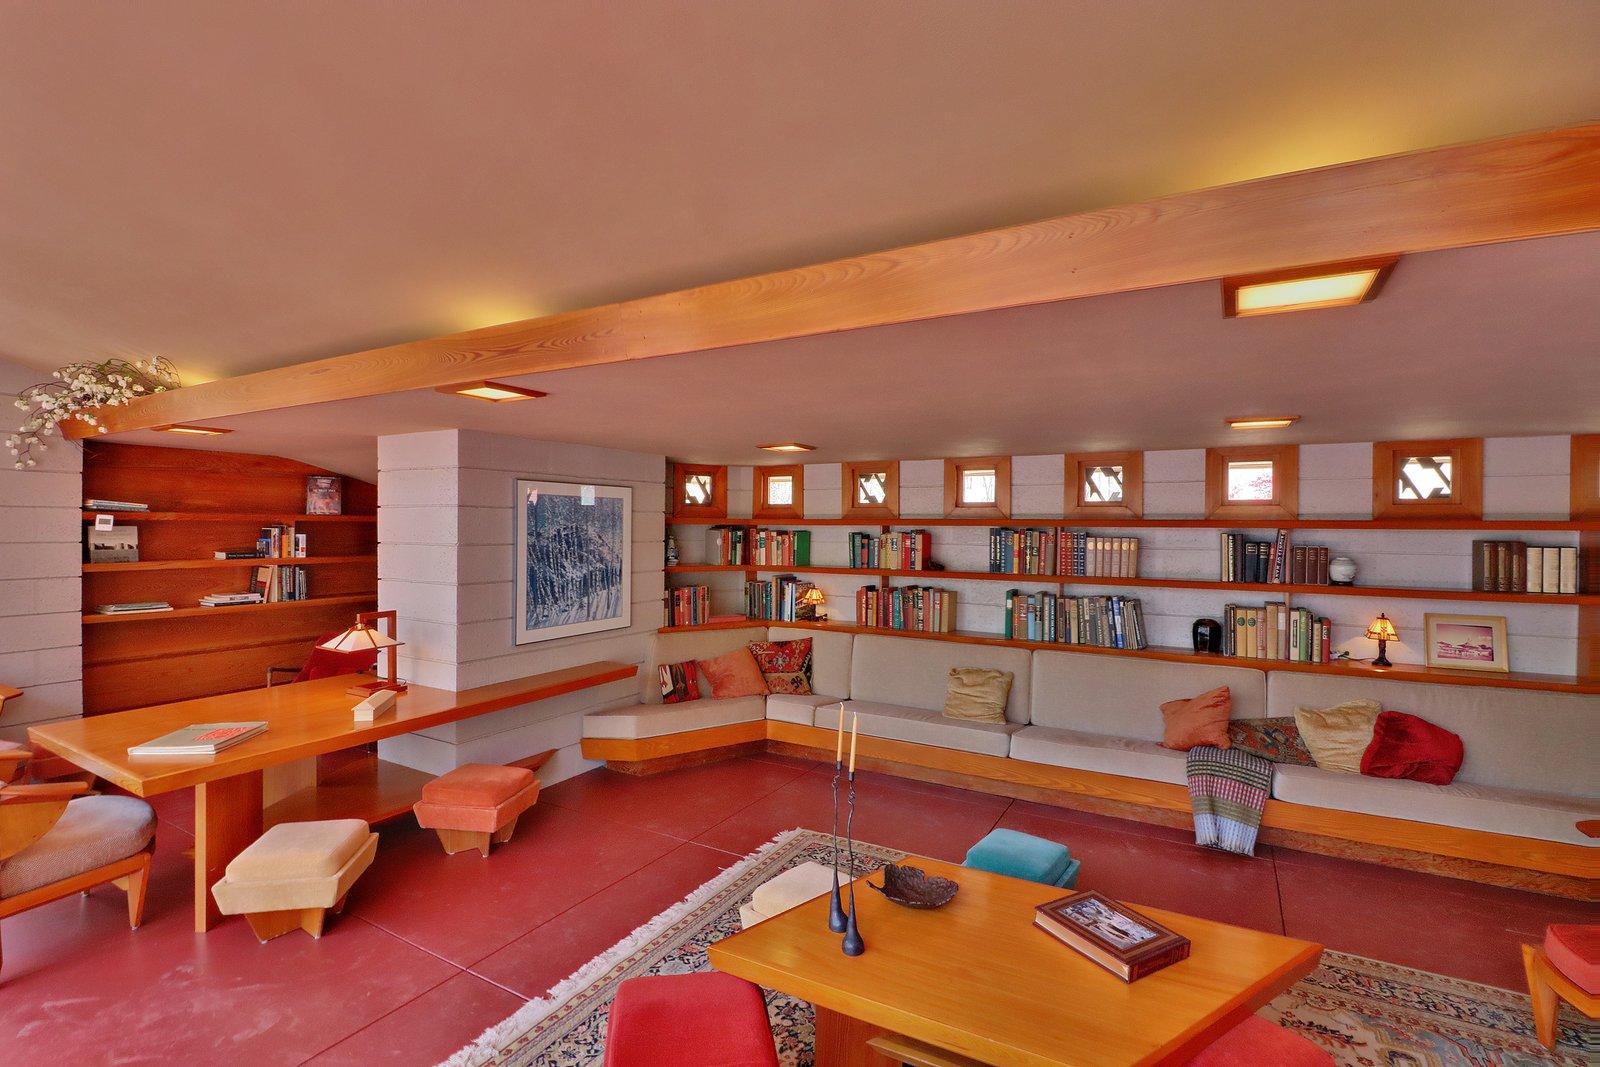 Frank Lloyd Wright's Mäntylä House